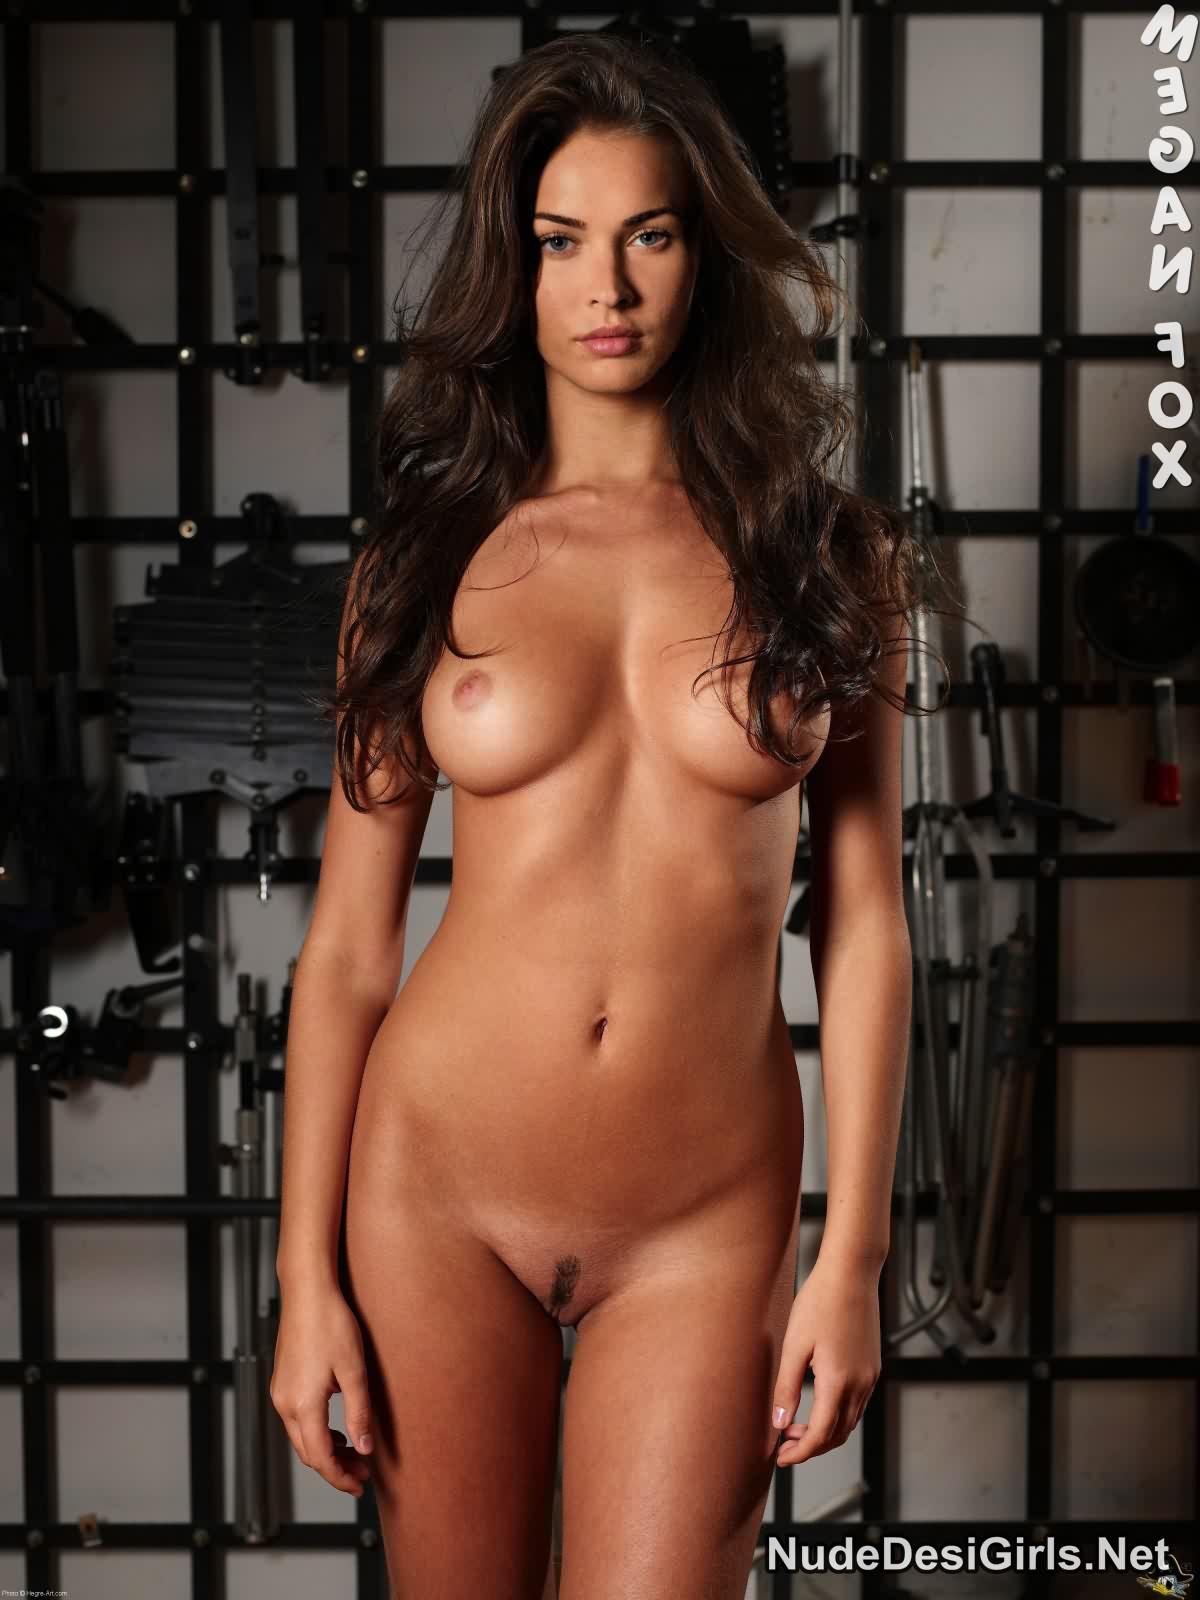 American Actress Nude Videos actress sex images - megapornx